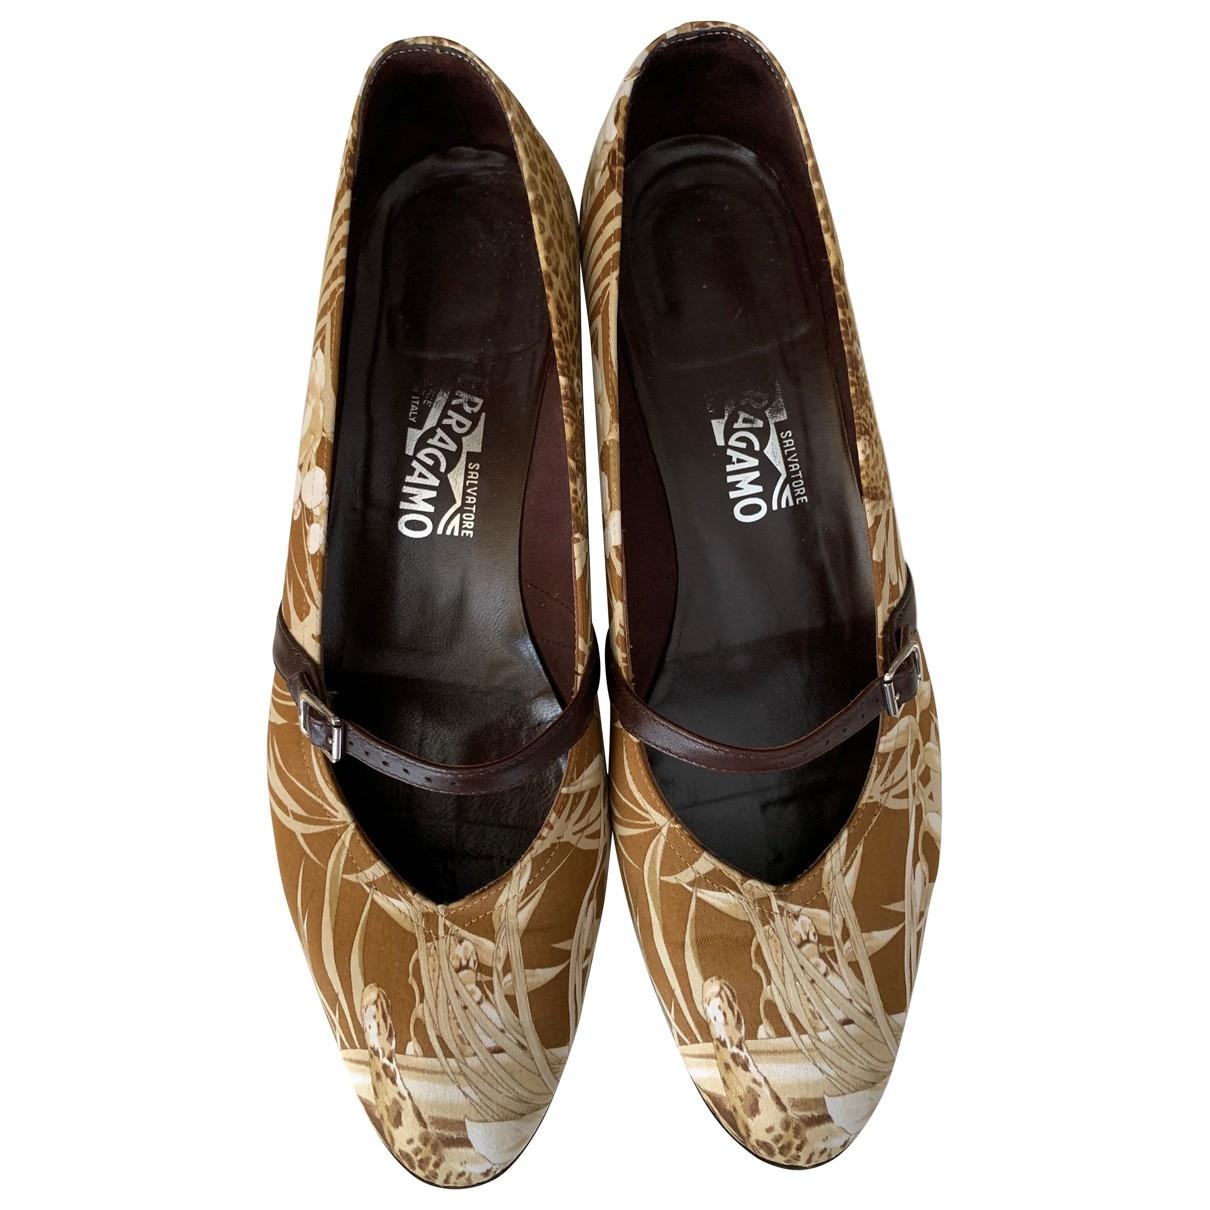 Salvatore Ferragamo \N Brown Cloth Ballet flats for Women 9.5 US